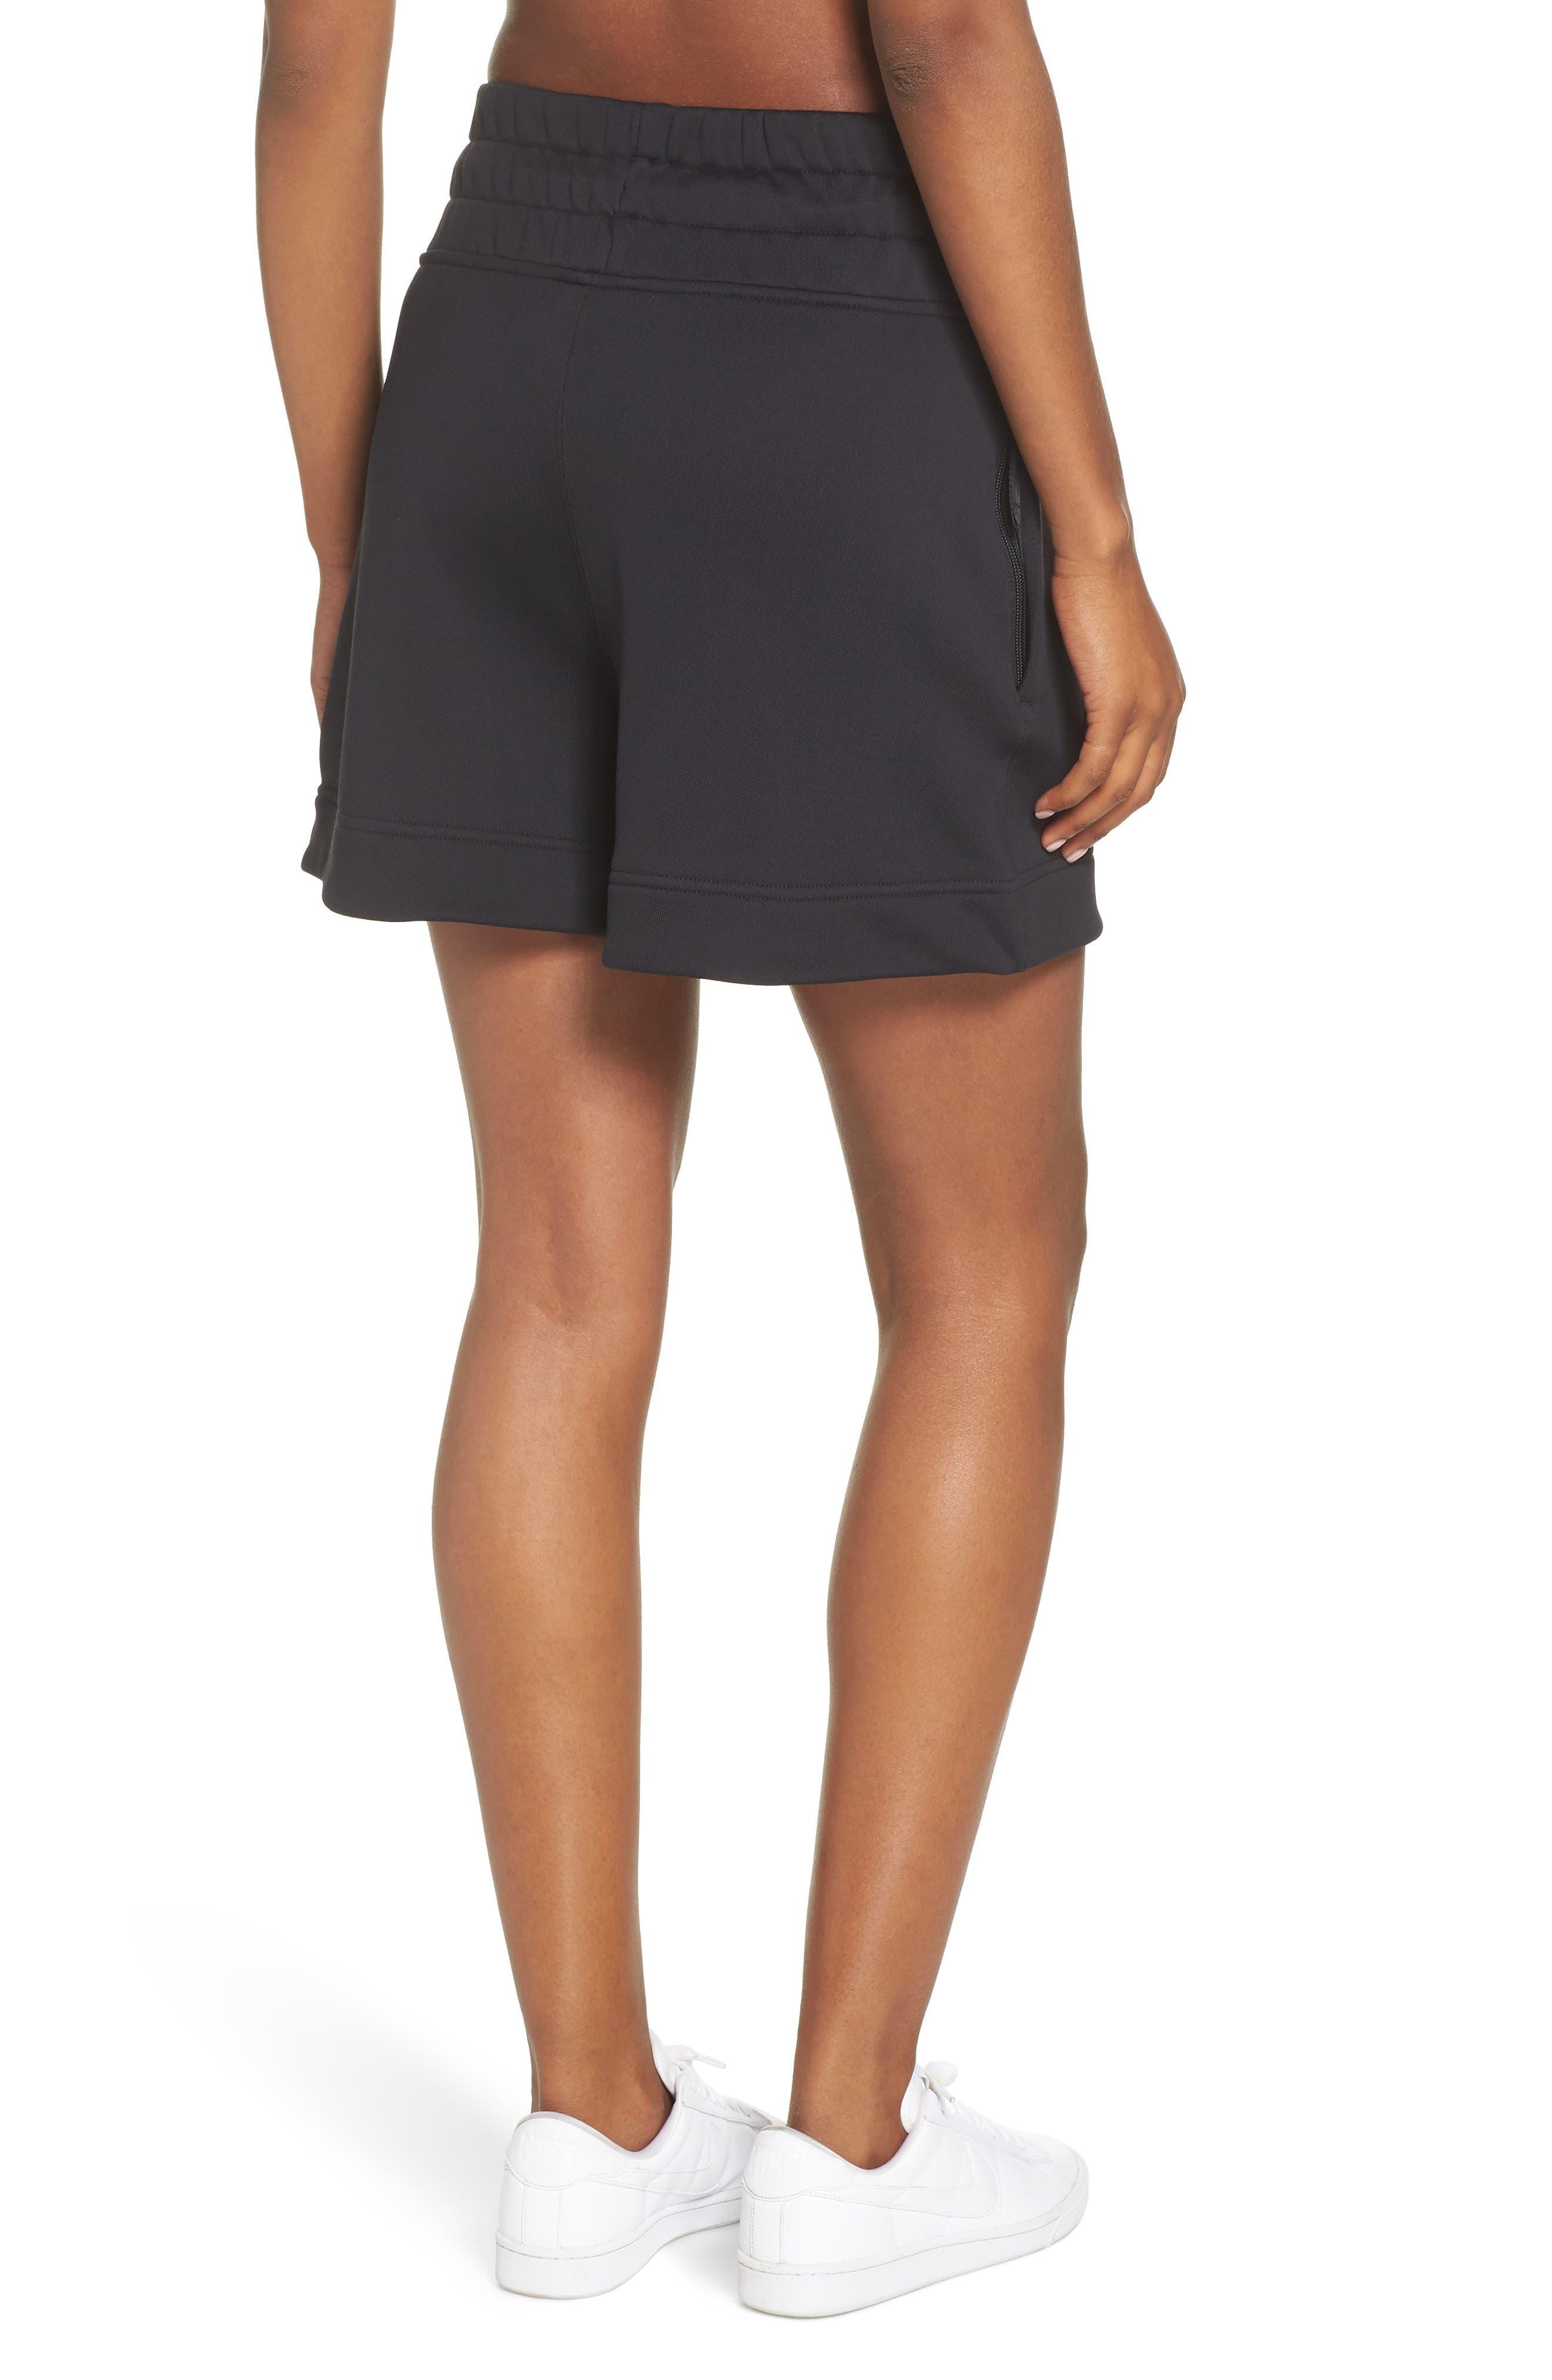 NikeLab Collection Women's Fleece Shorts,                             Alternate thumbnail 2, color,                             BLACK/ BLACK